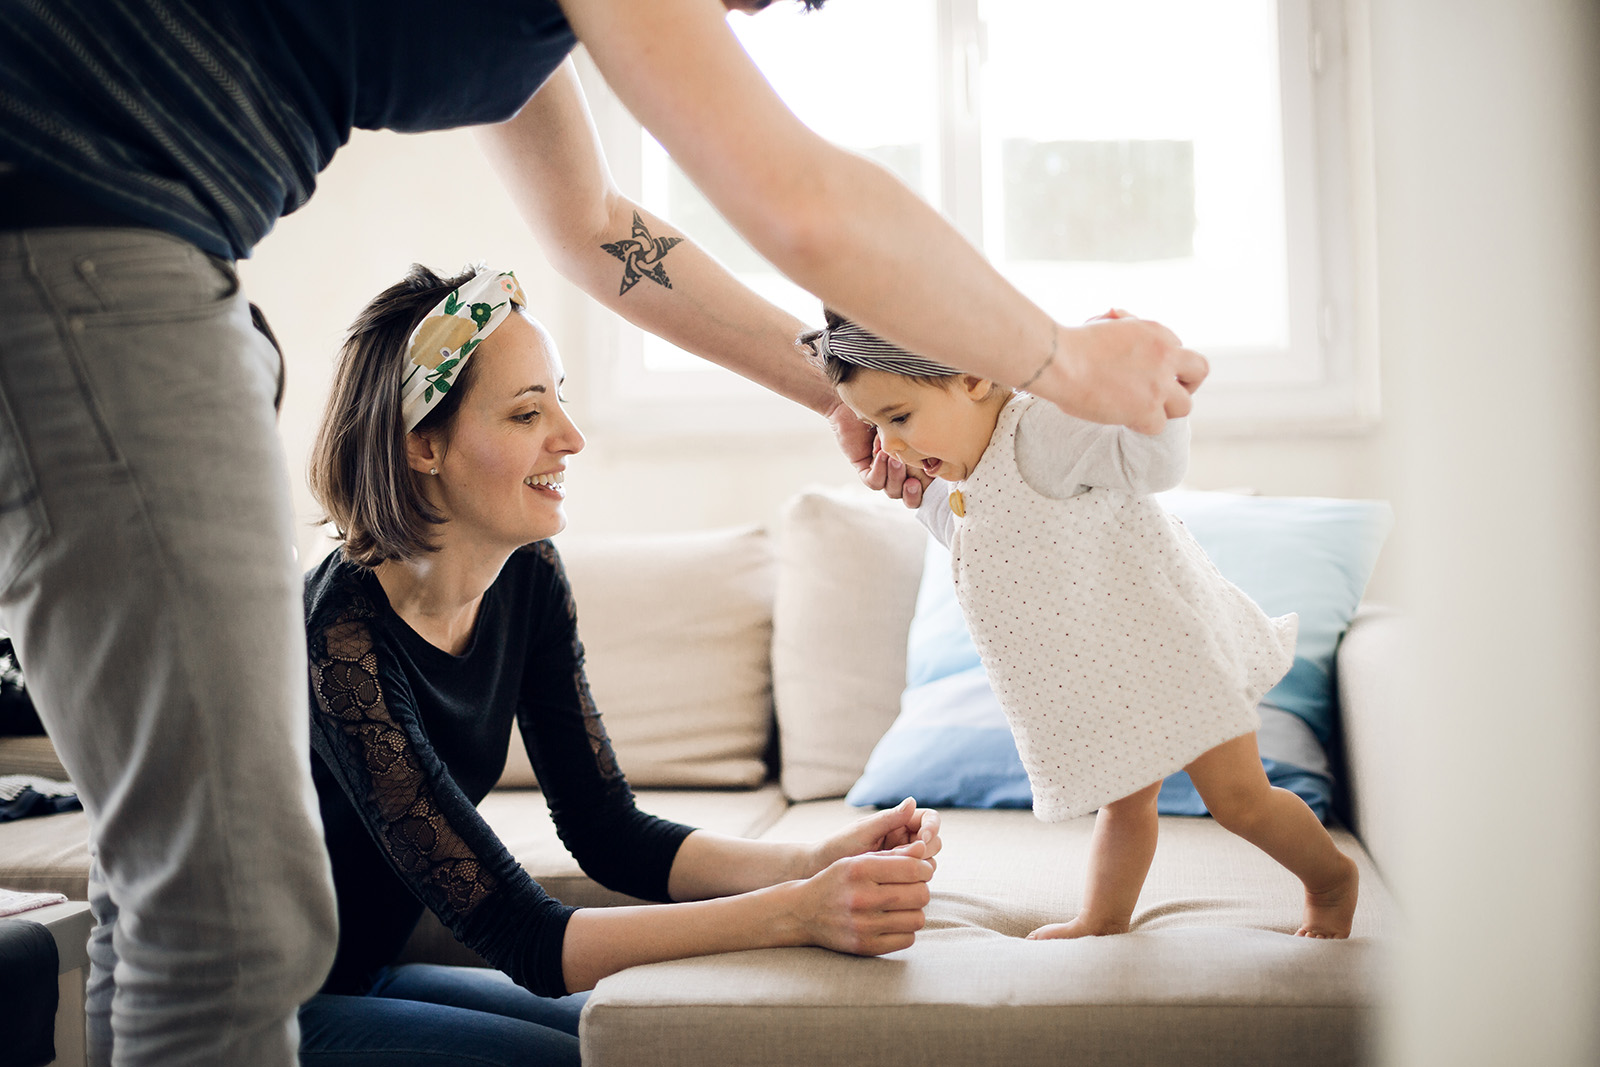 seance-photo-famille-bebe-enfant-maternite-elise-julliard-photographe-lyon-auvergne-rhone-alpes-ain-portrait-couple-3